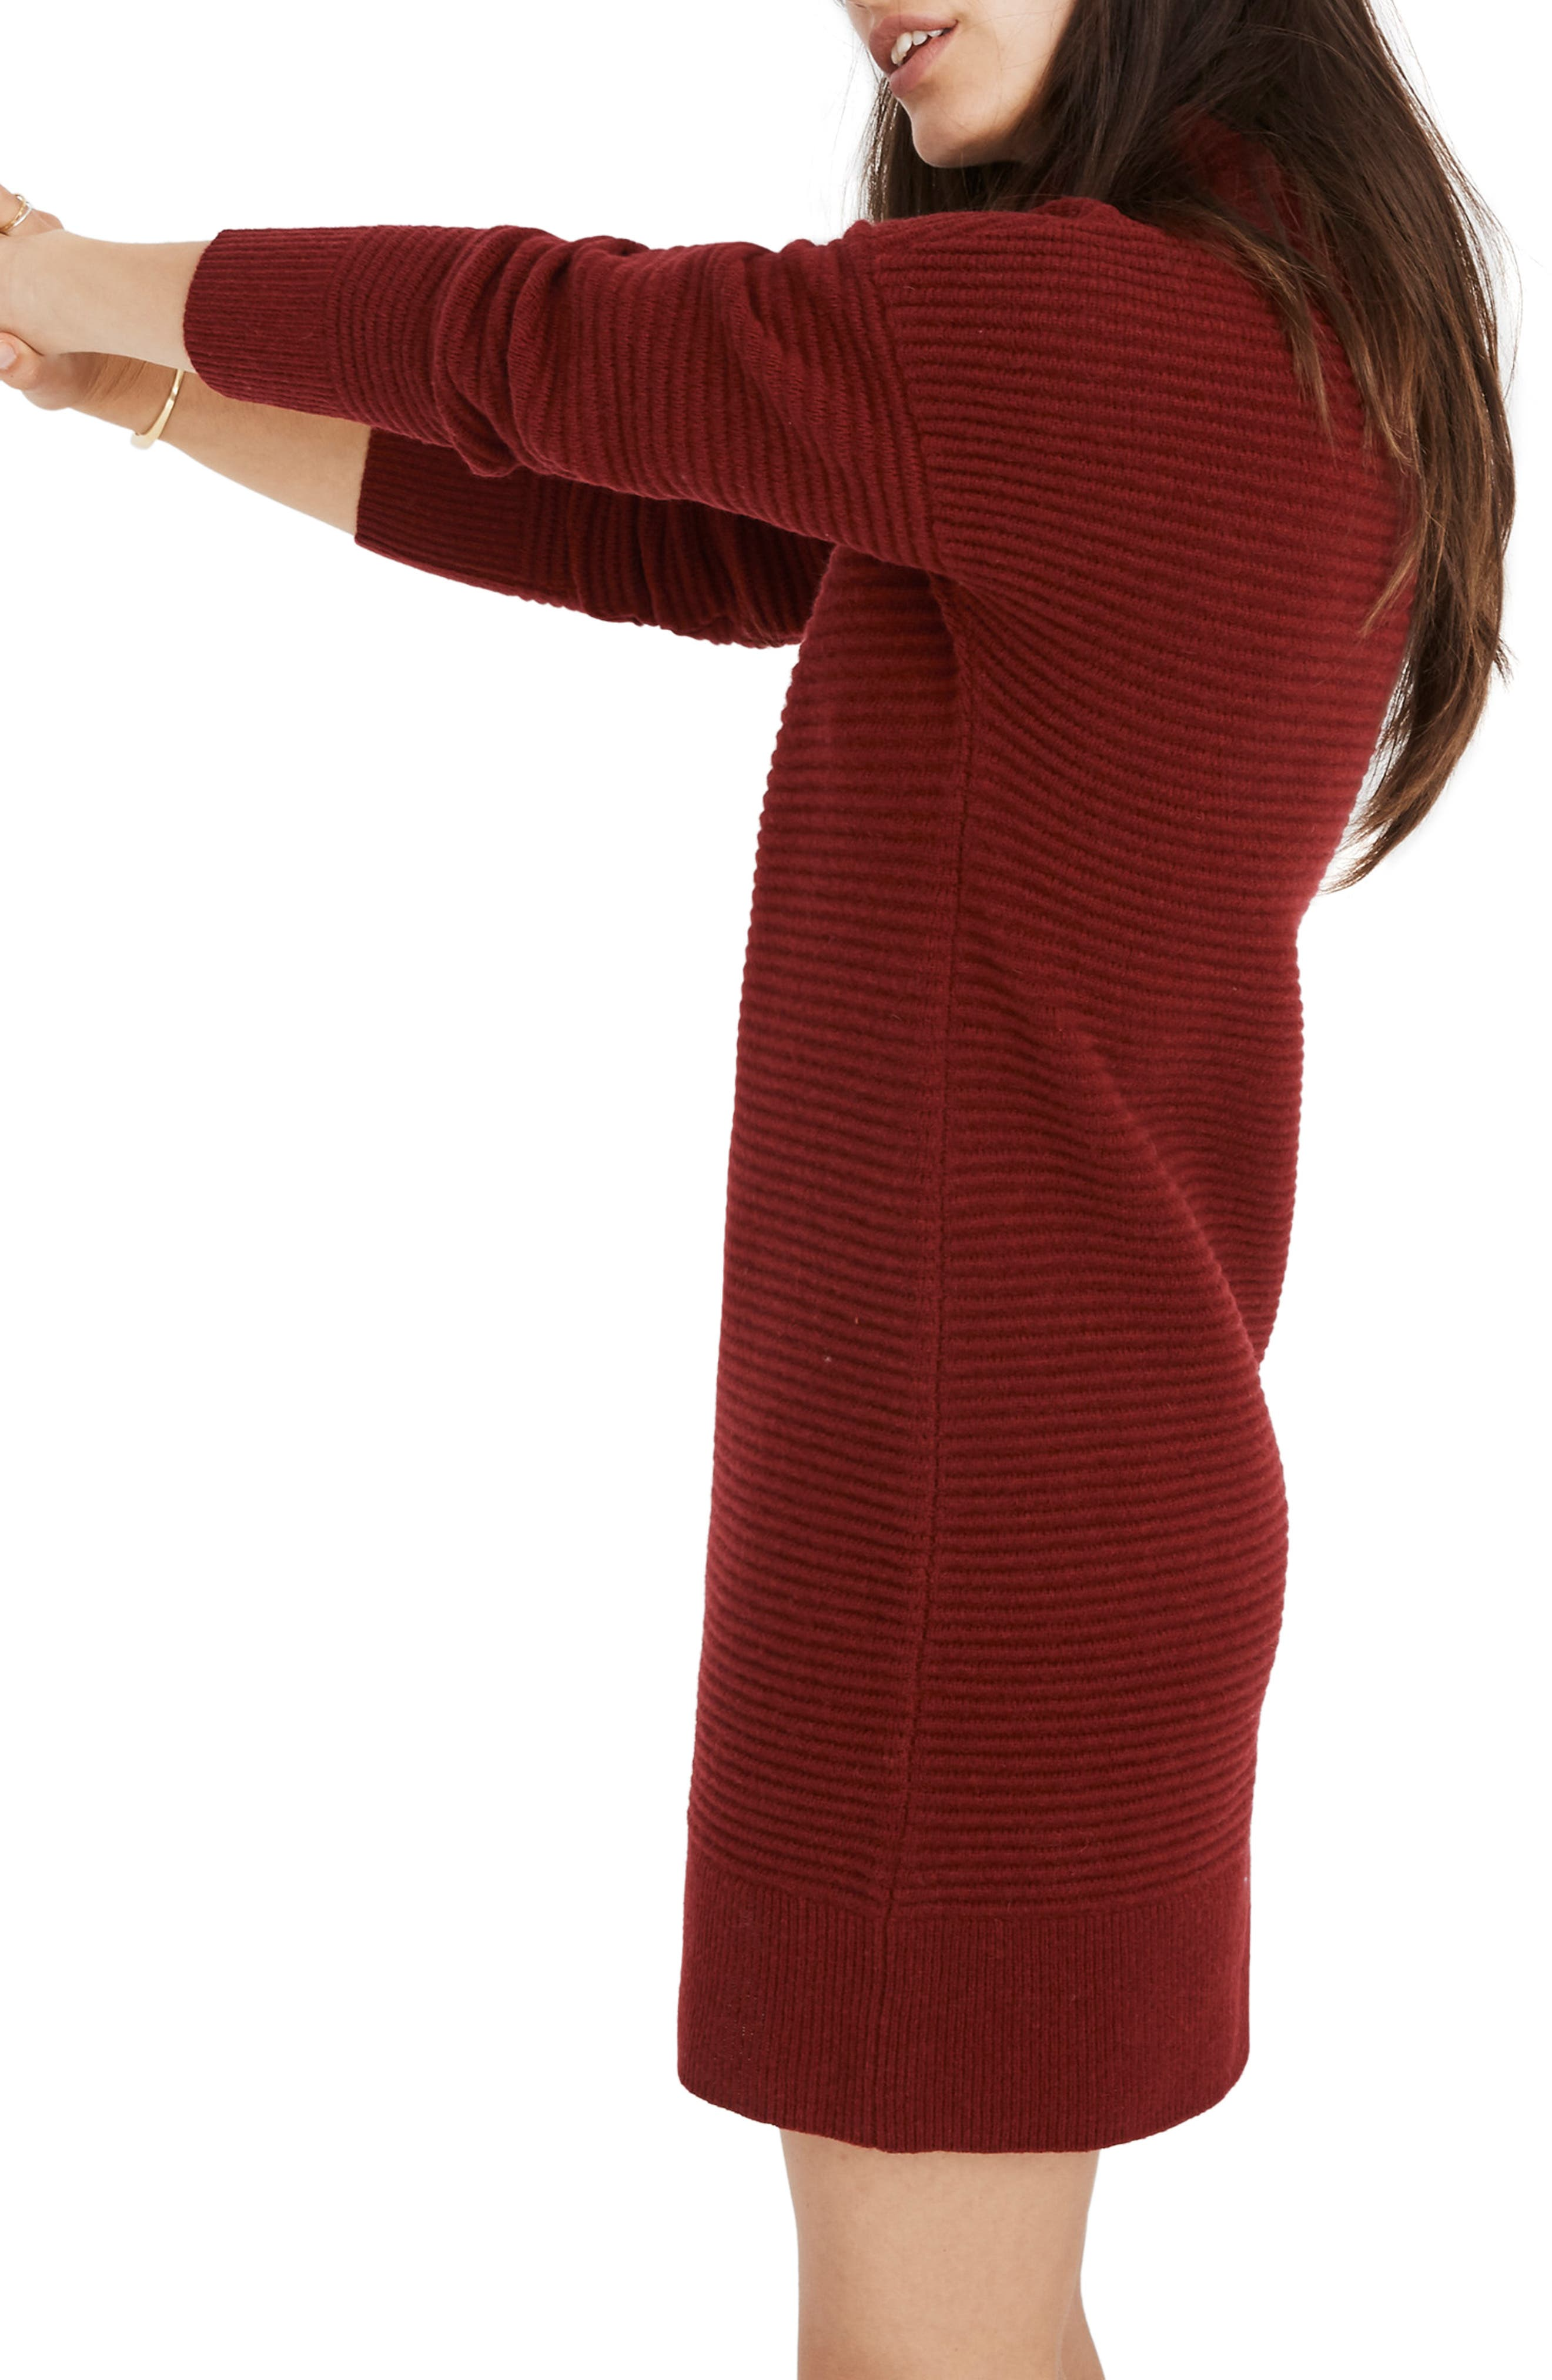 Skyscraper Merino Wool Sweater Dress,                             Alternate thumbnail 3, color,                             HEATHER BURGUNDY